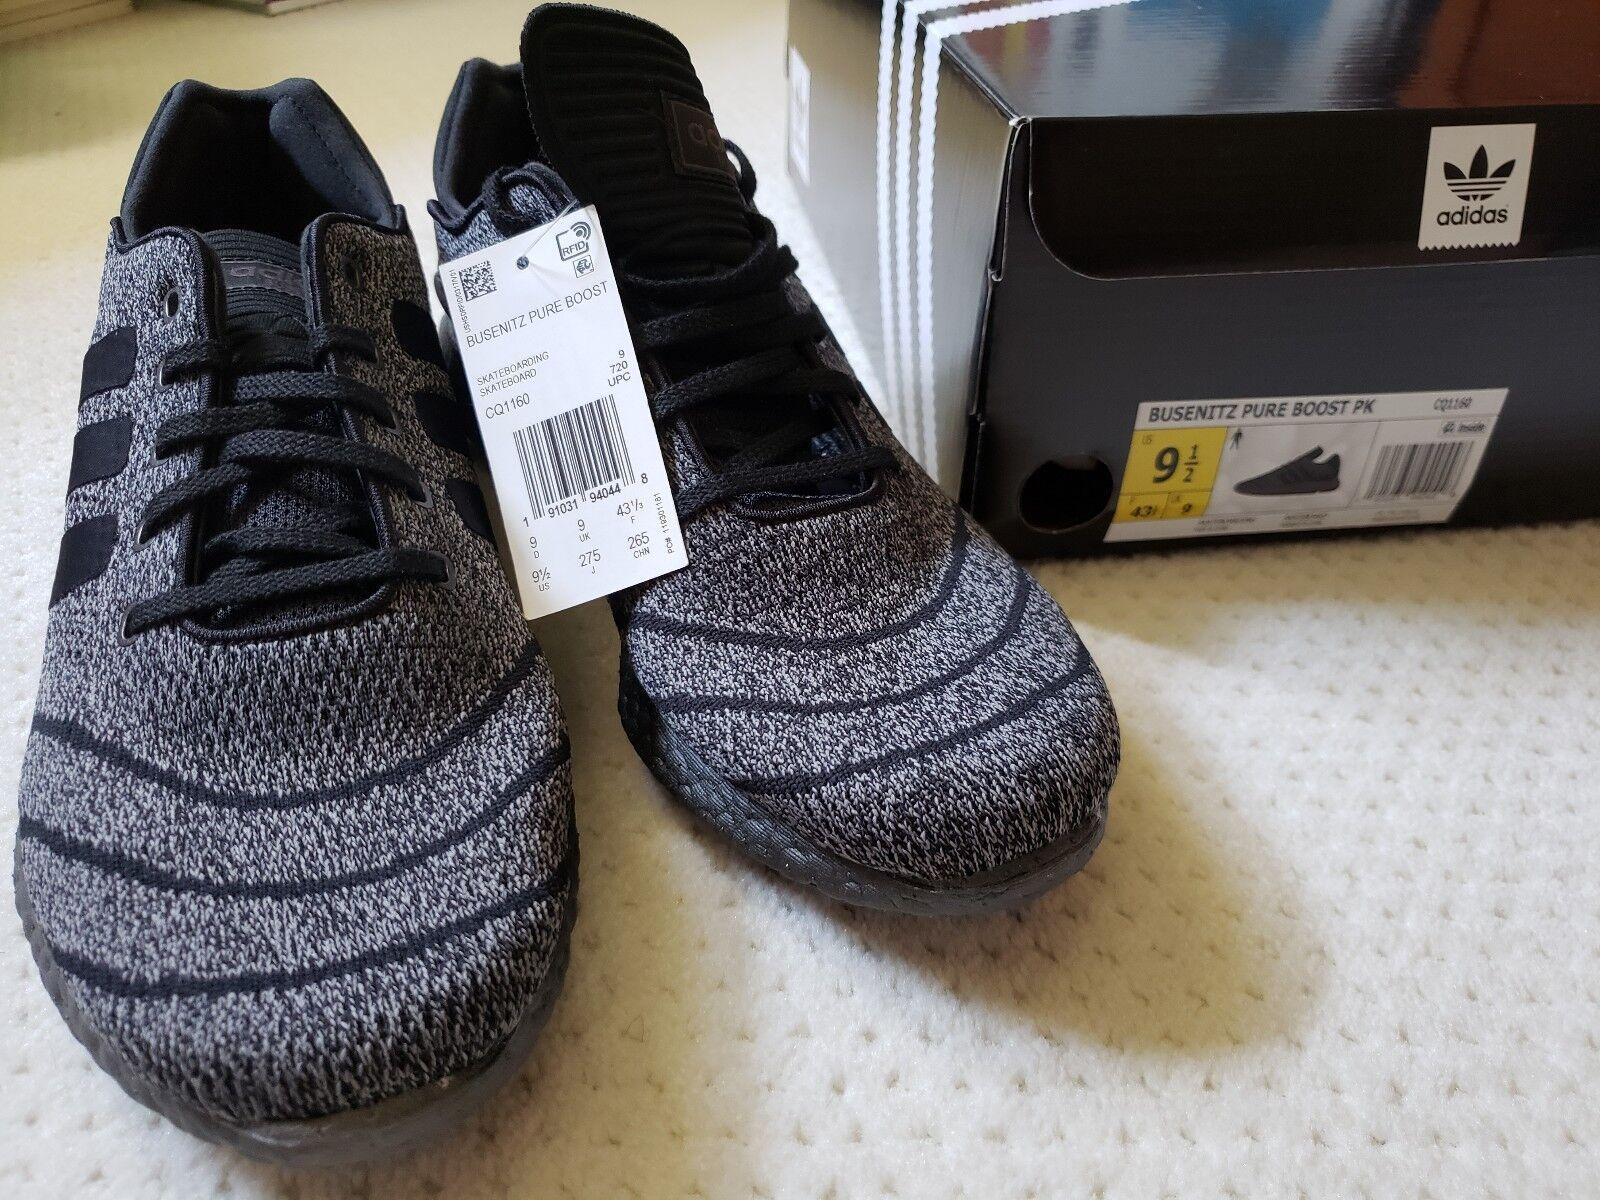 Adidas Busenitz Pure Boost PK Triple Black Grey Running Shoes 11.5 Mens CQ1160 191031936229 | eBay